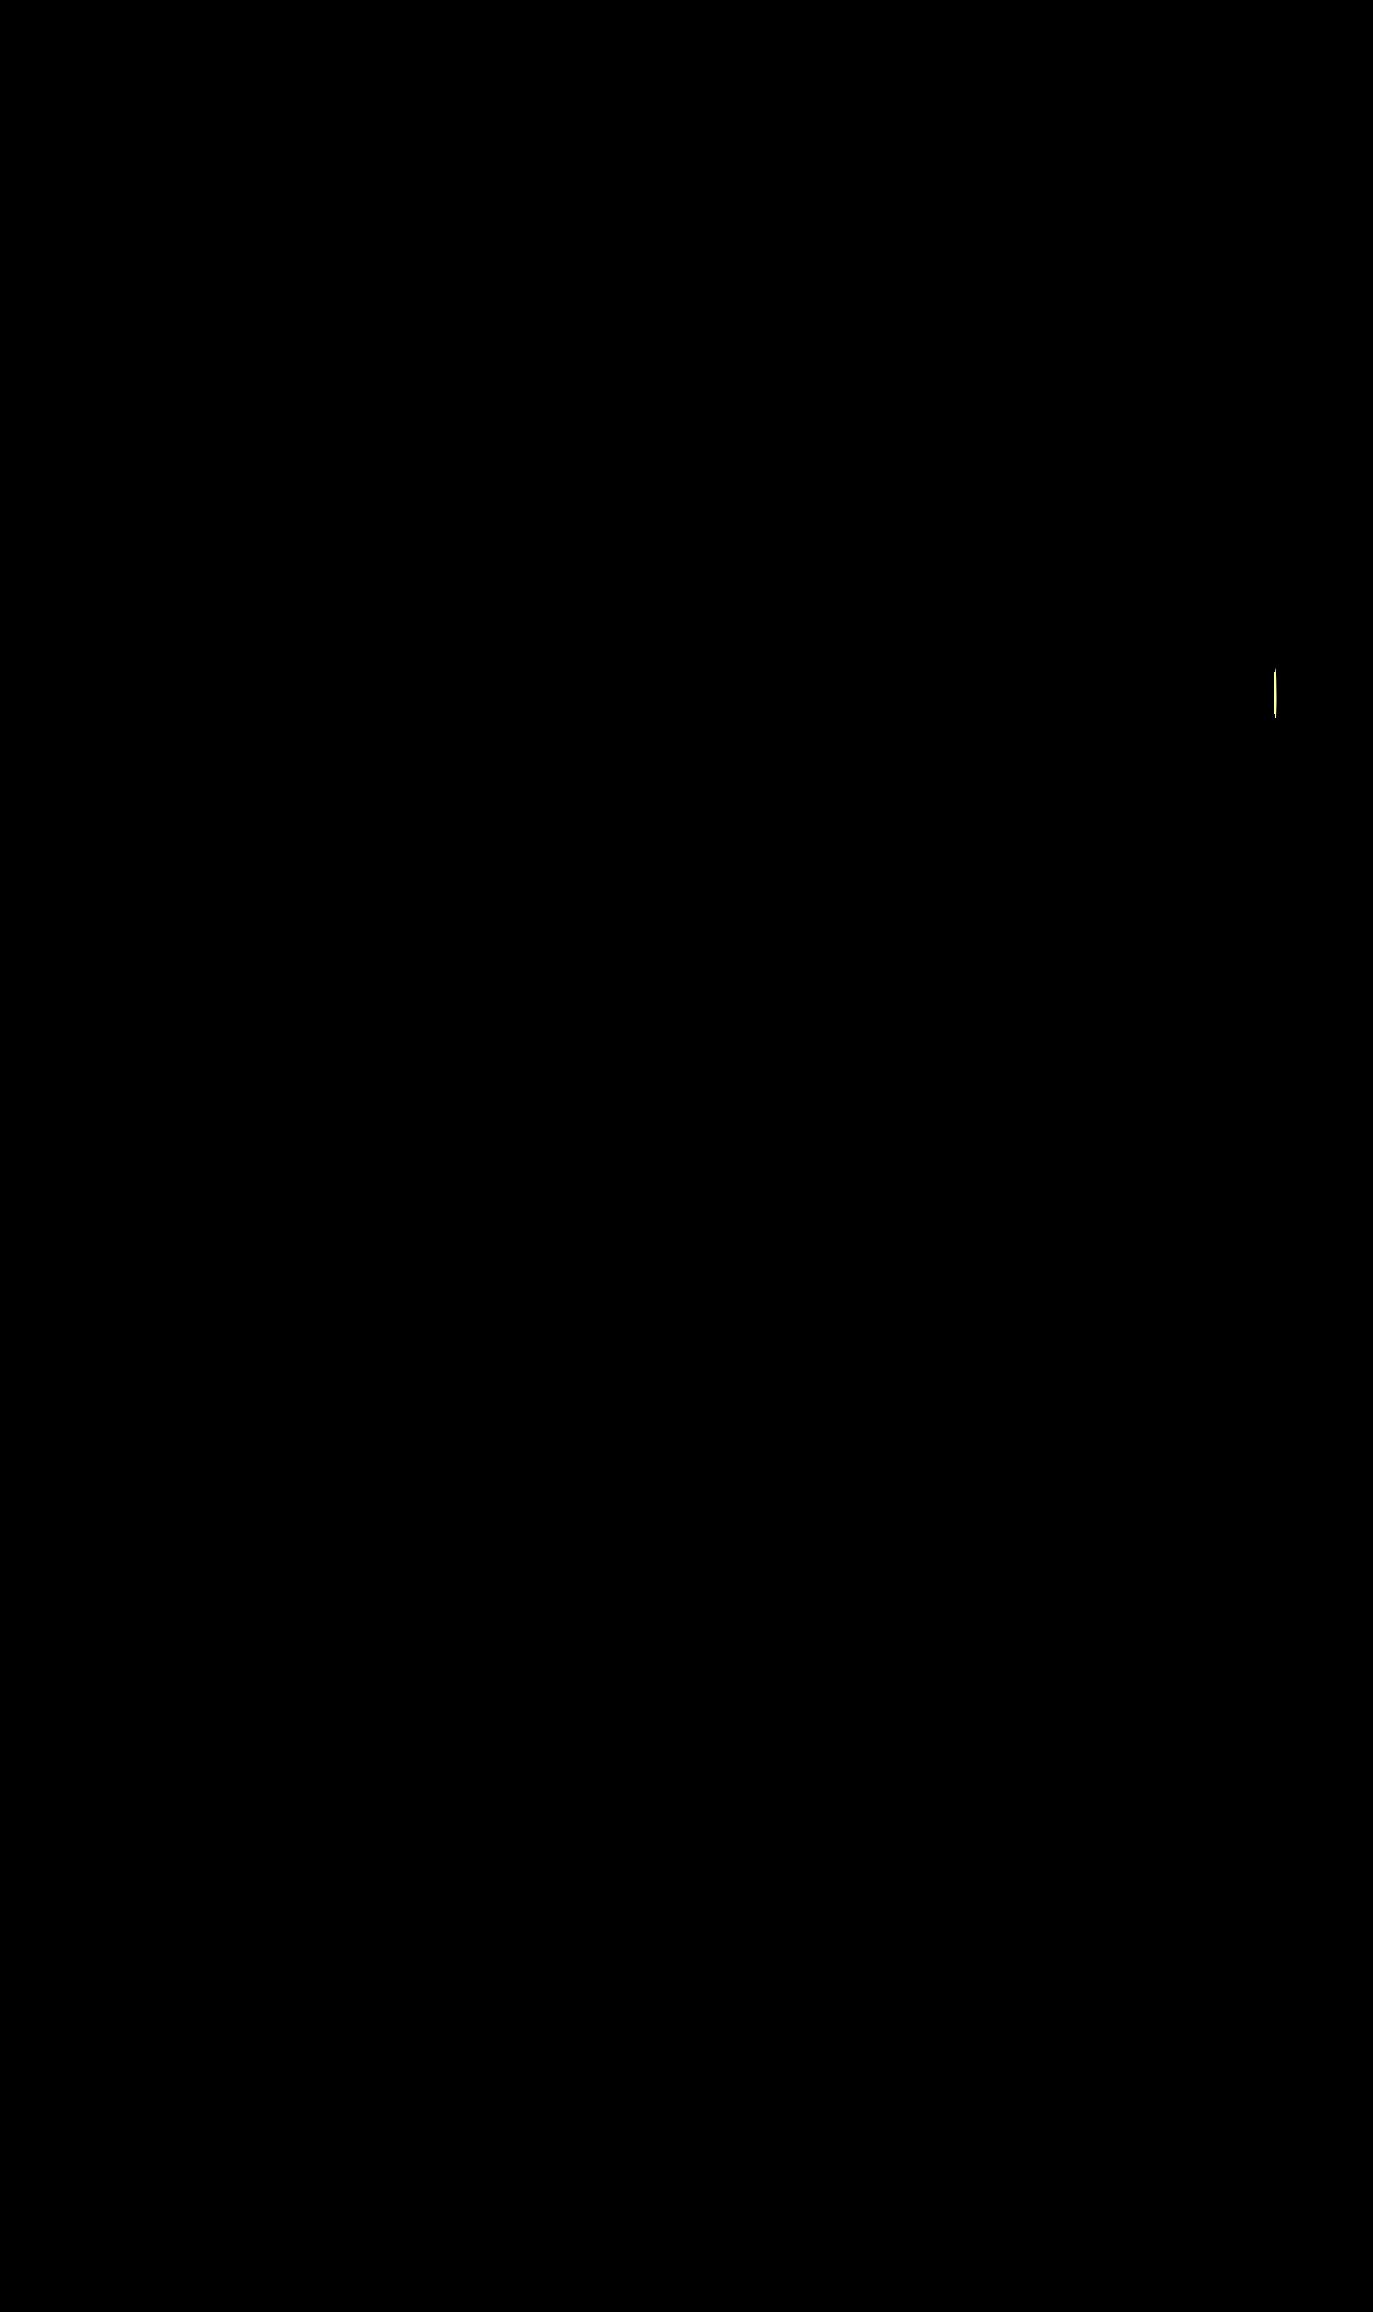 Clipart anthropomorphic big image. Light bulb clip art silhouette